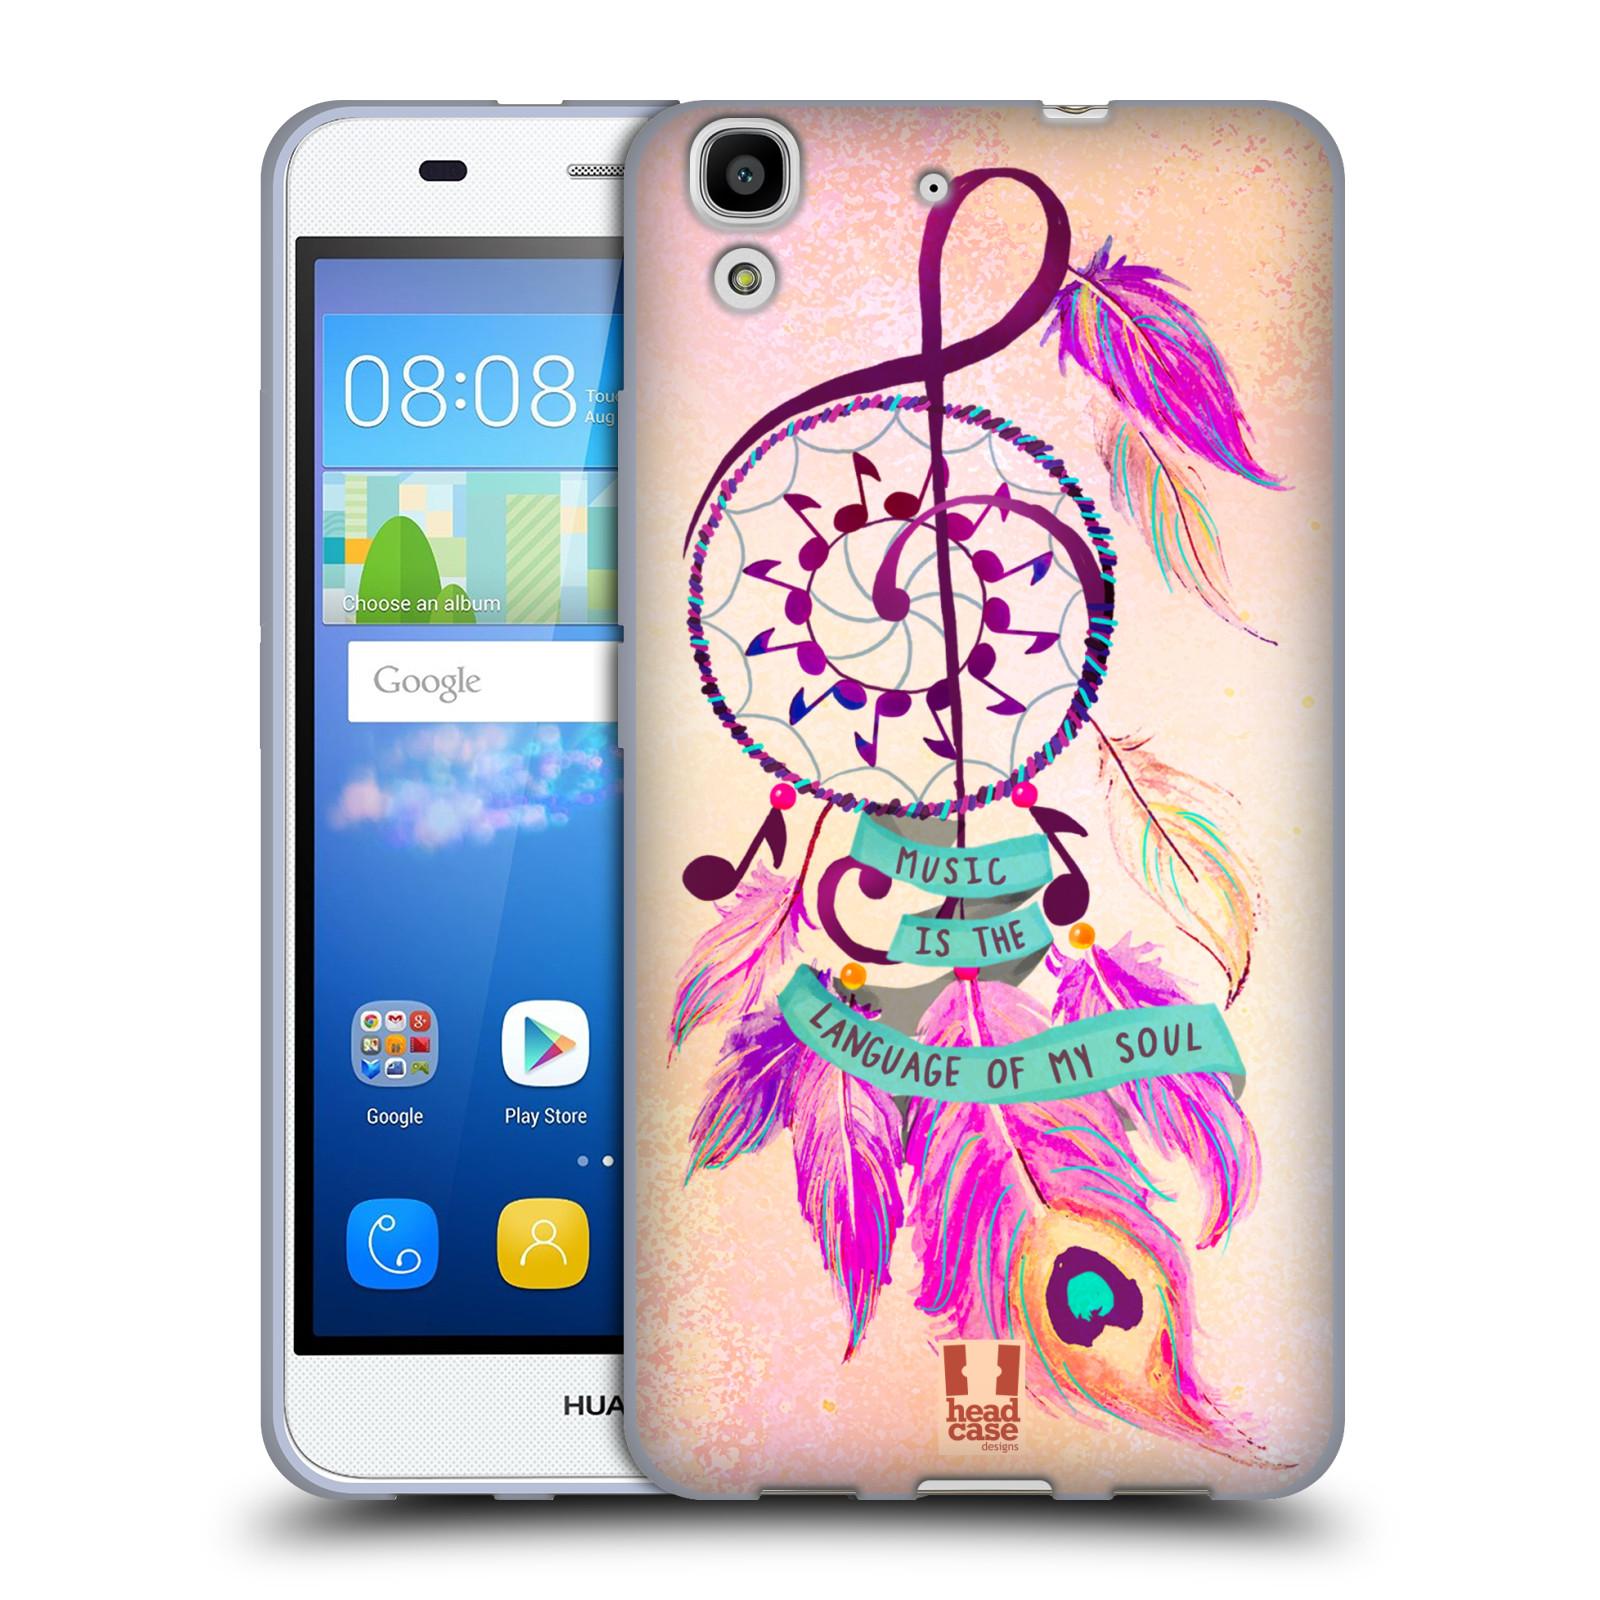 Silikonové pouzdro na mobil Huawei Y6 HEAD CASE Lapač Assorted Music